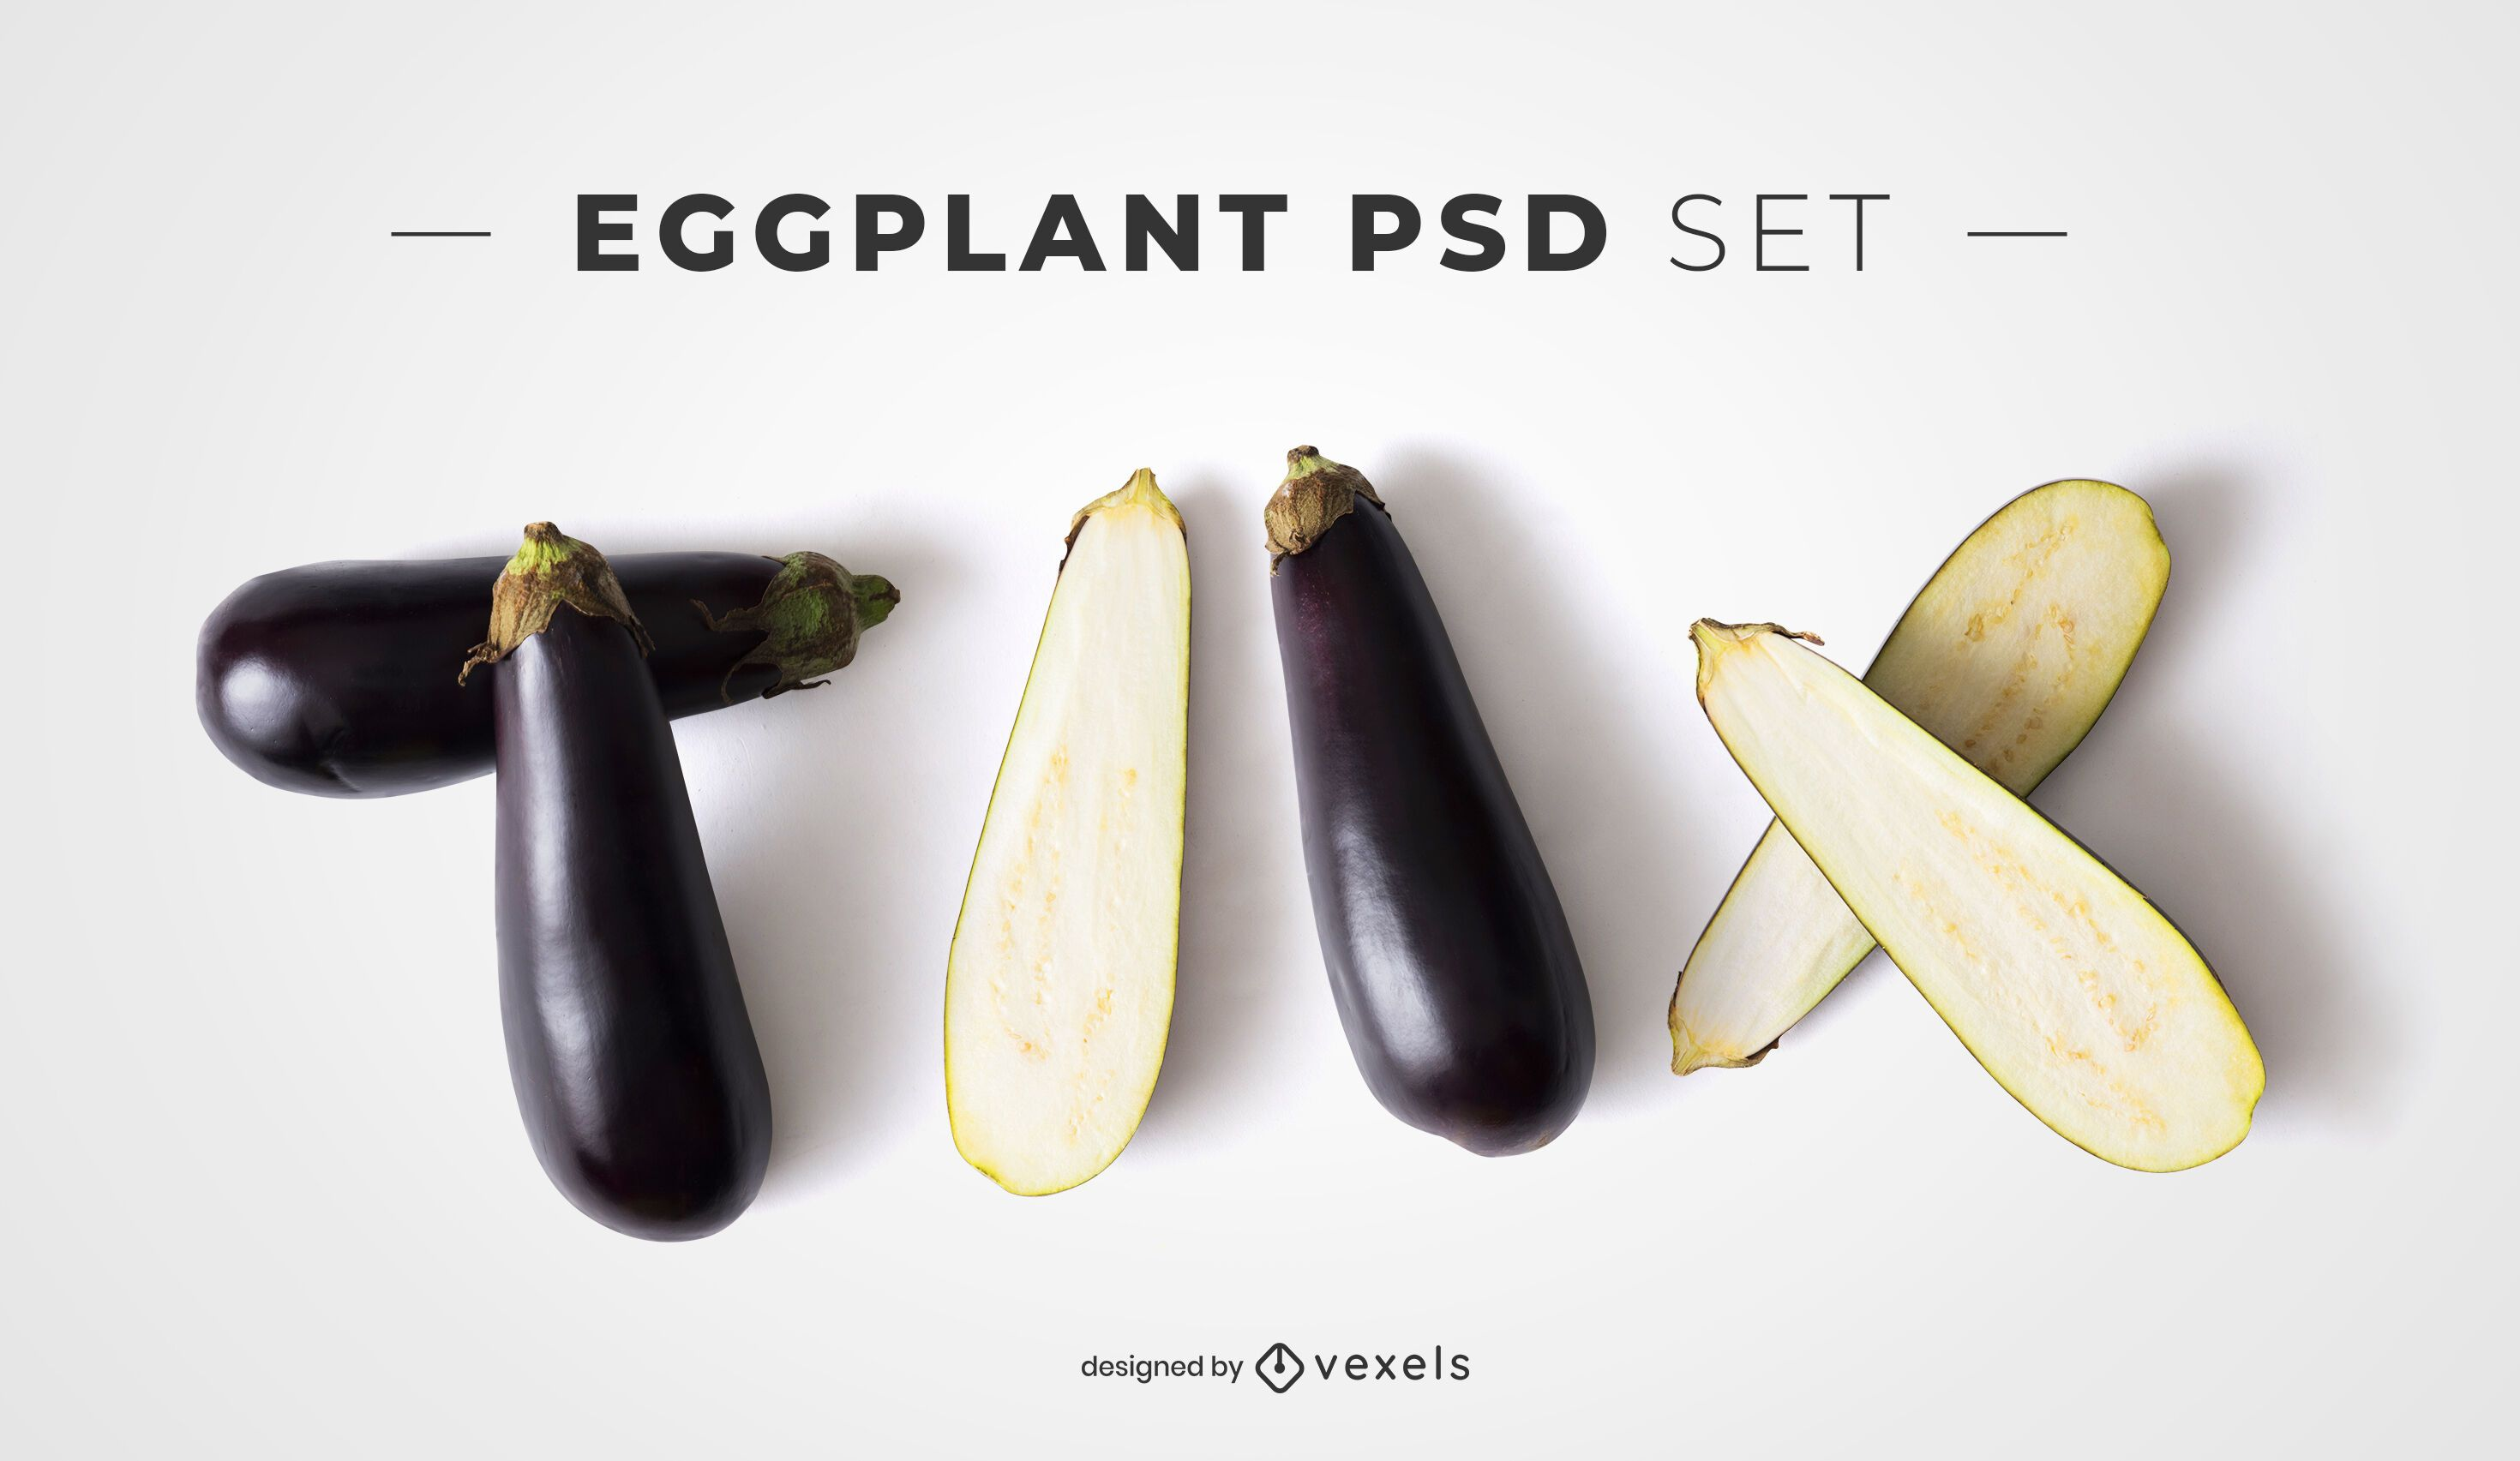 Eggplants psd elements for mockups